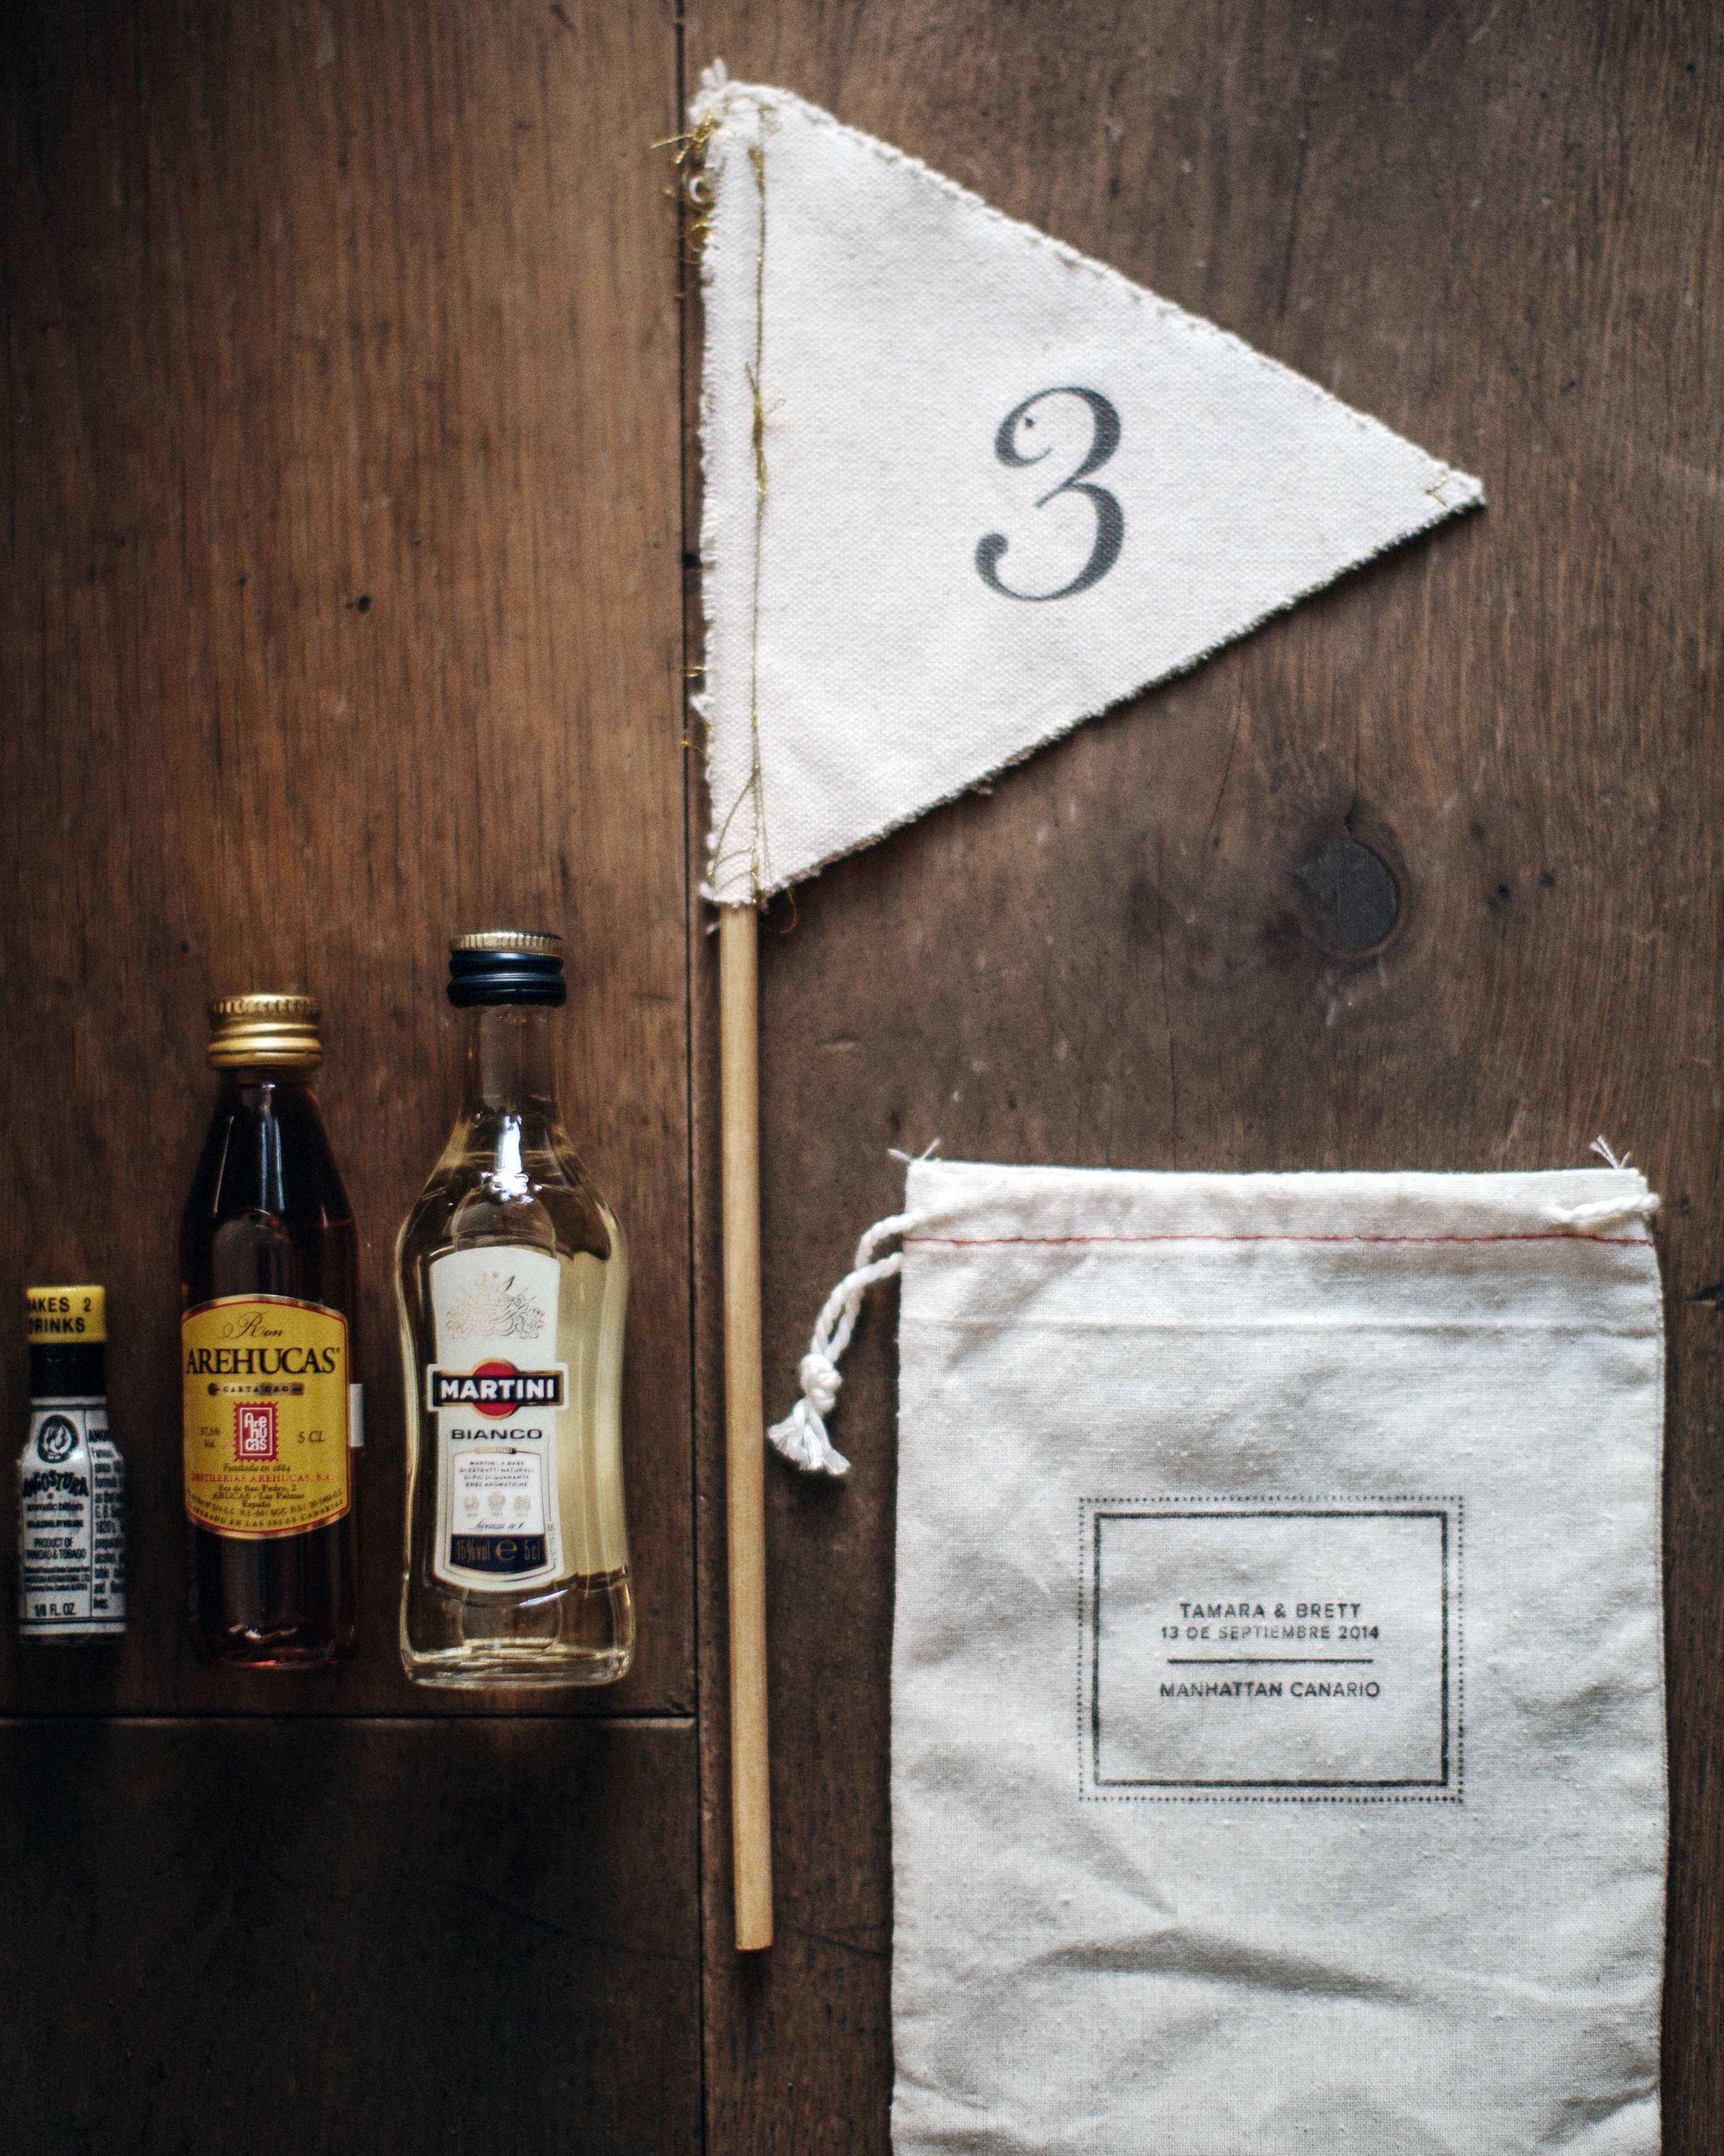 Cocktail Kit Wedding Favors